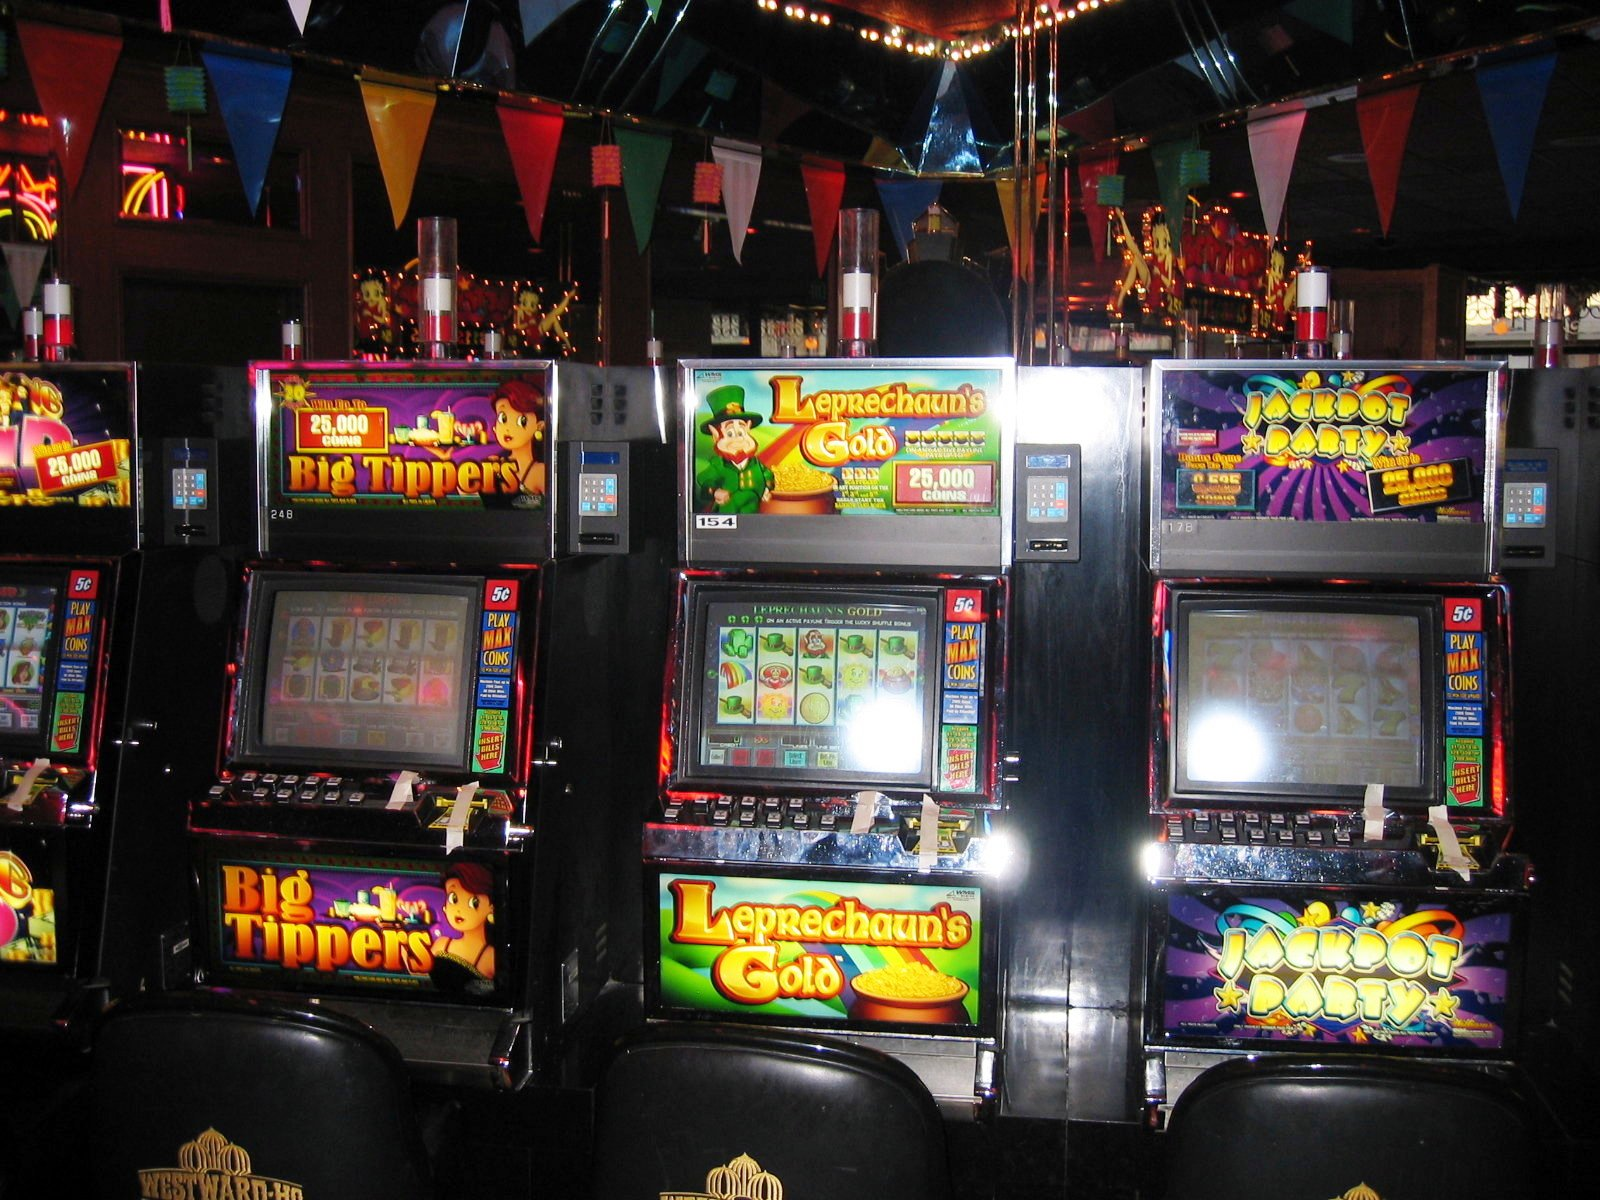 Westward ho casino closes hoosier park casino coupons